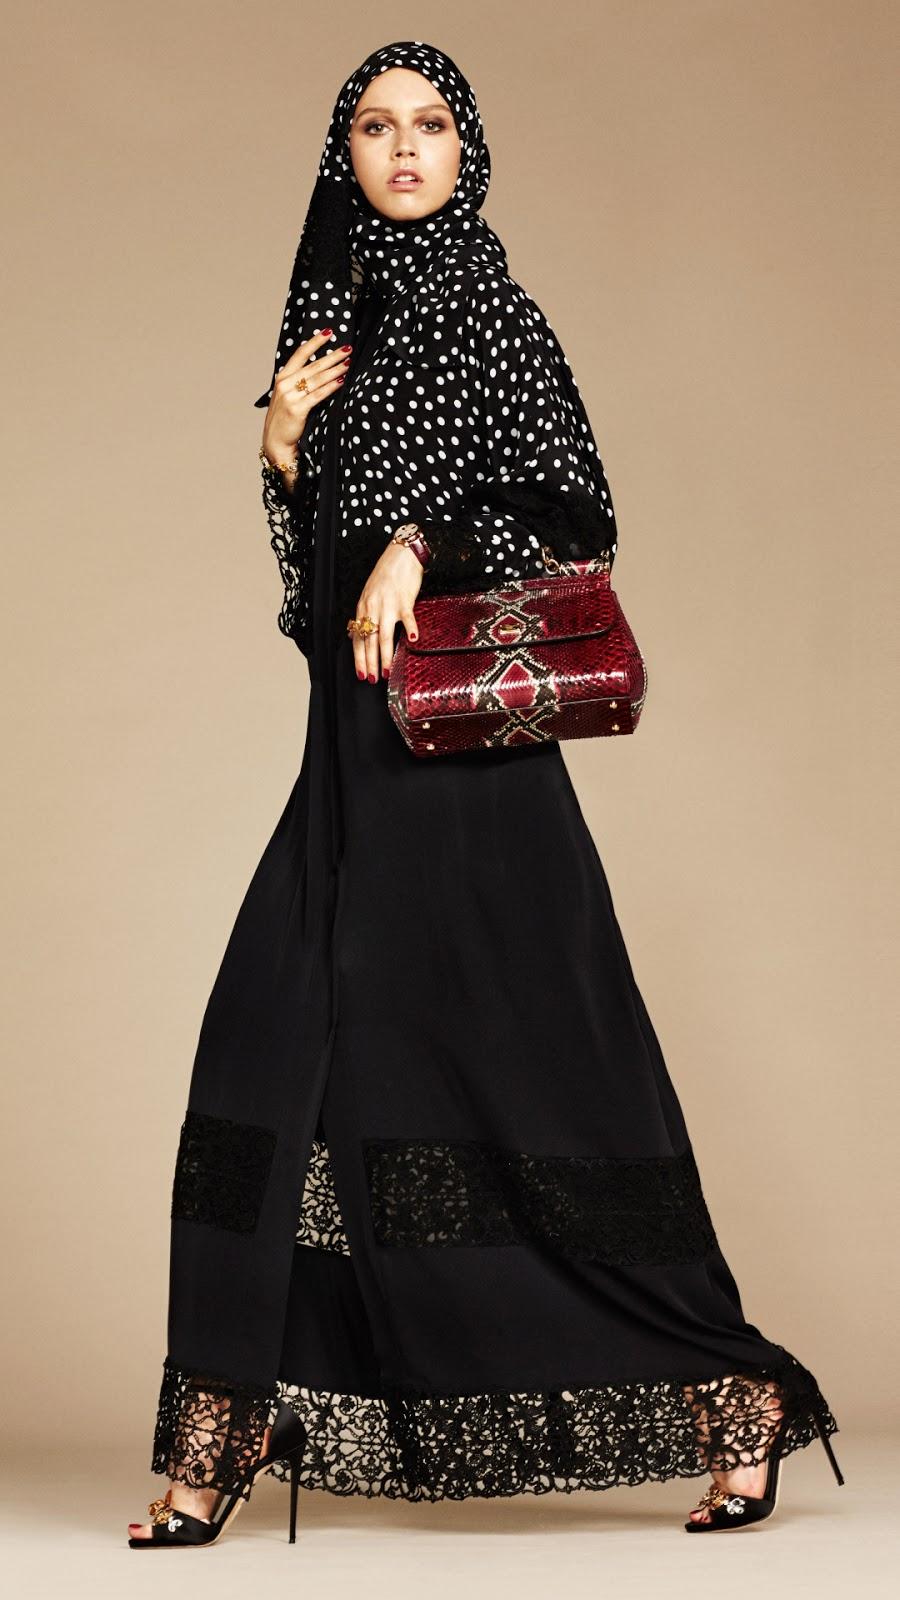 wallpaper hijab cantik manis polkadot